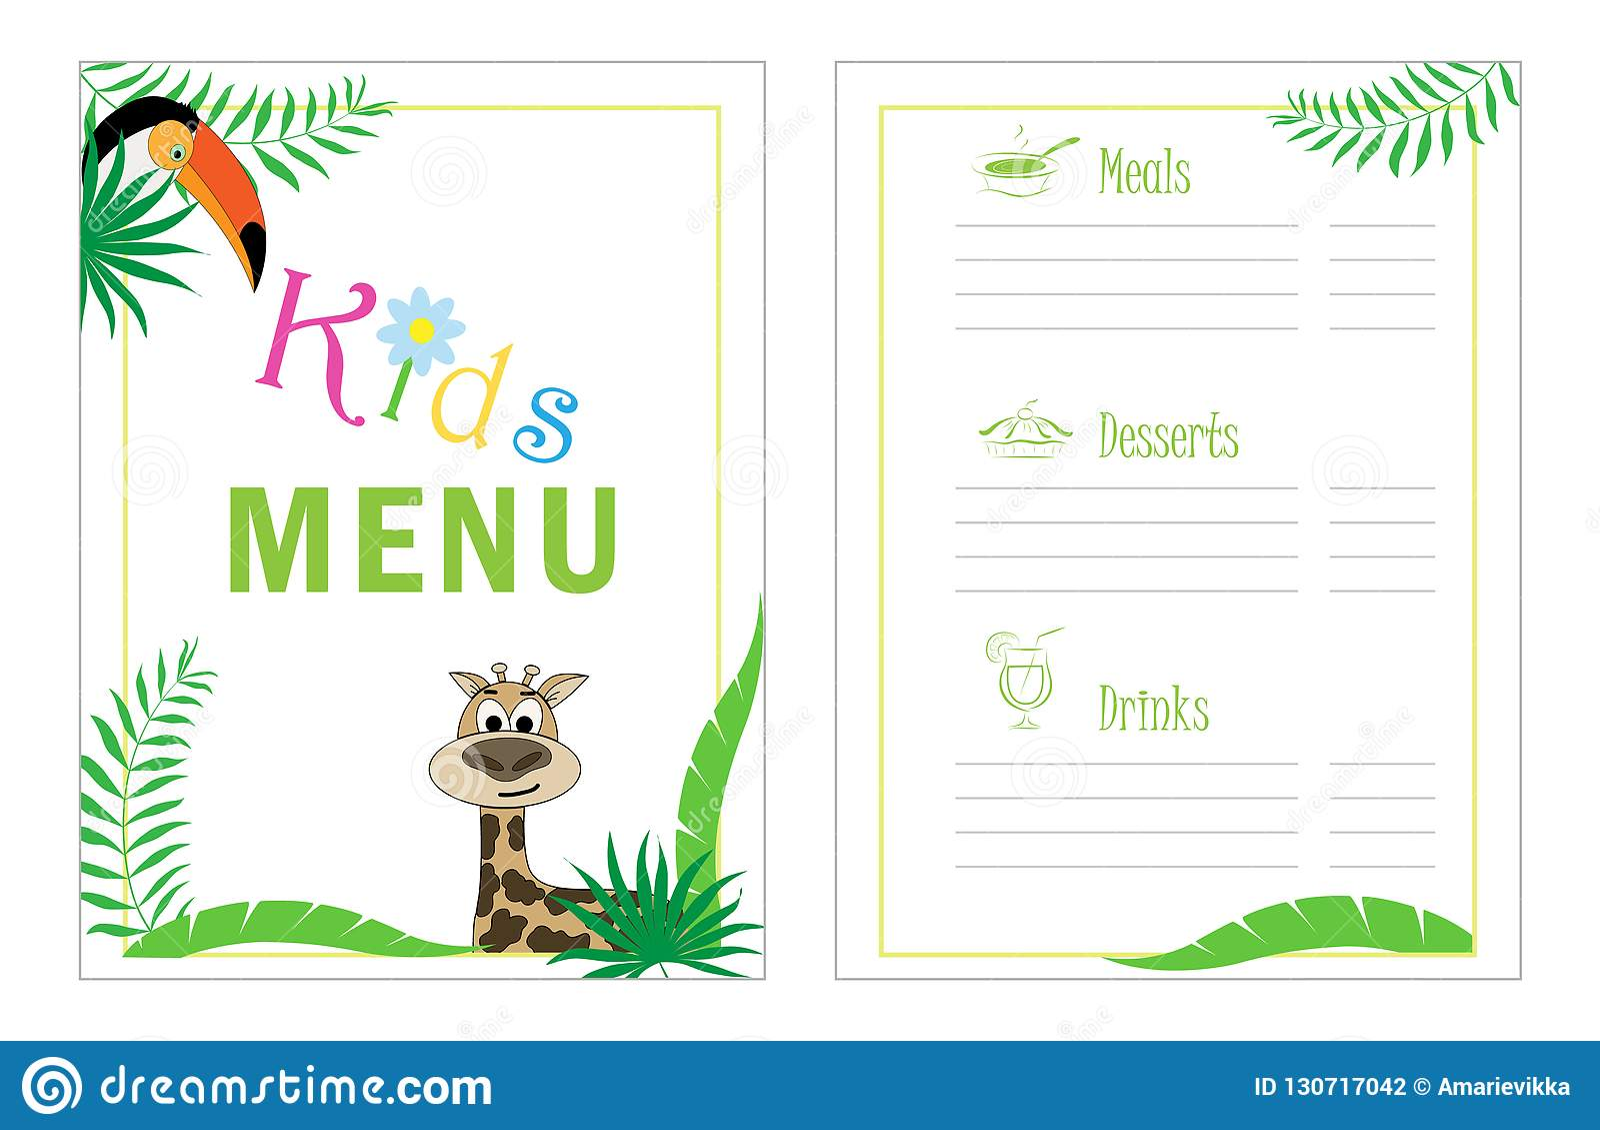 childrens menu template cafe menu design for kids kid menu frame